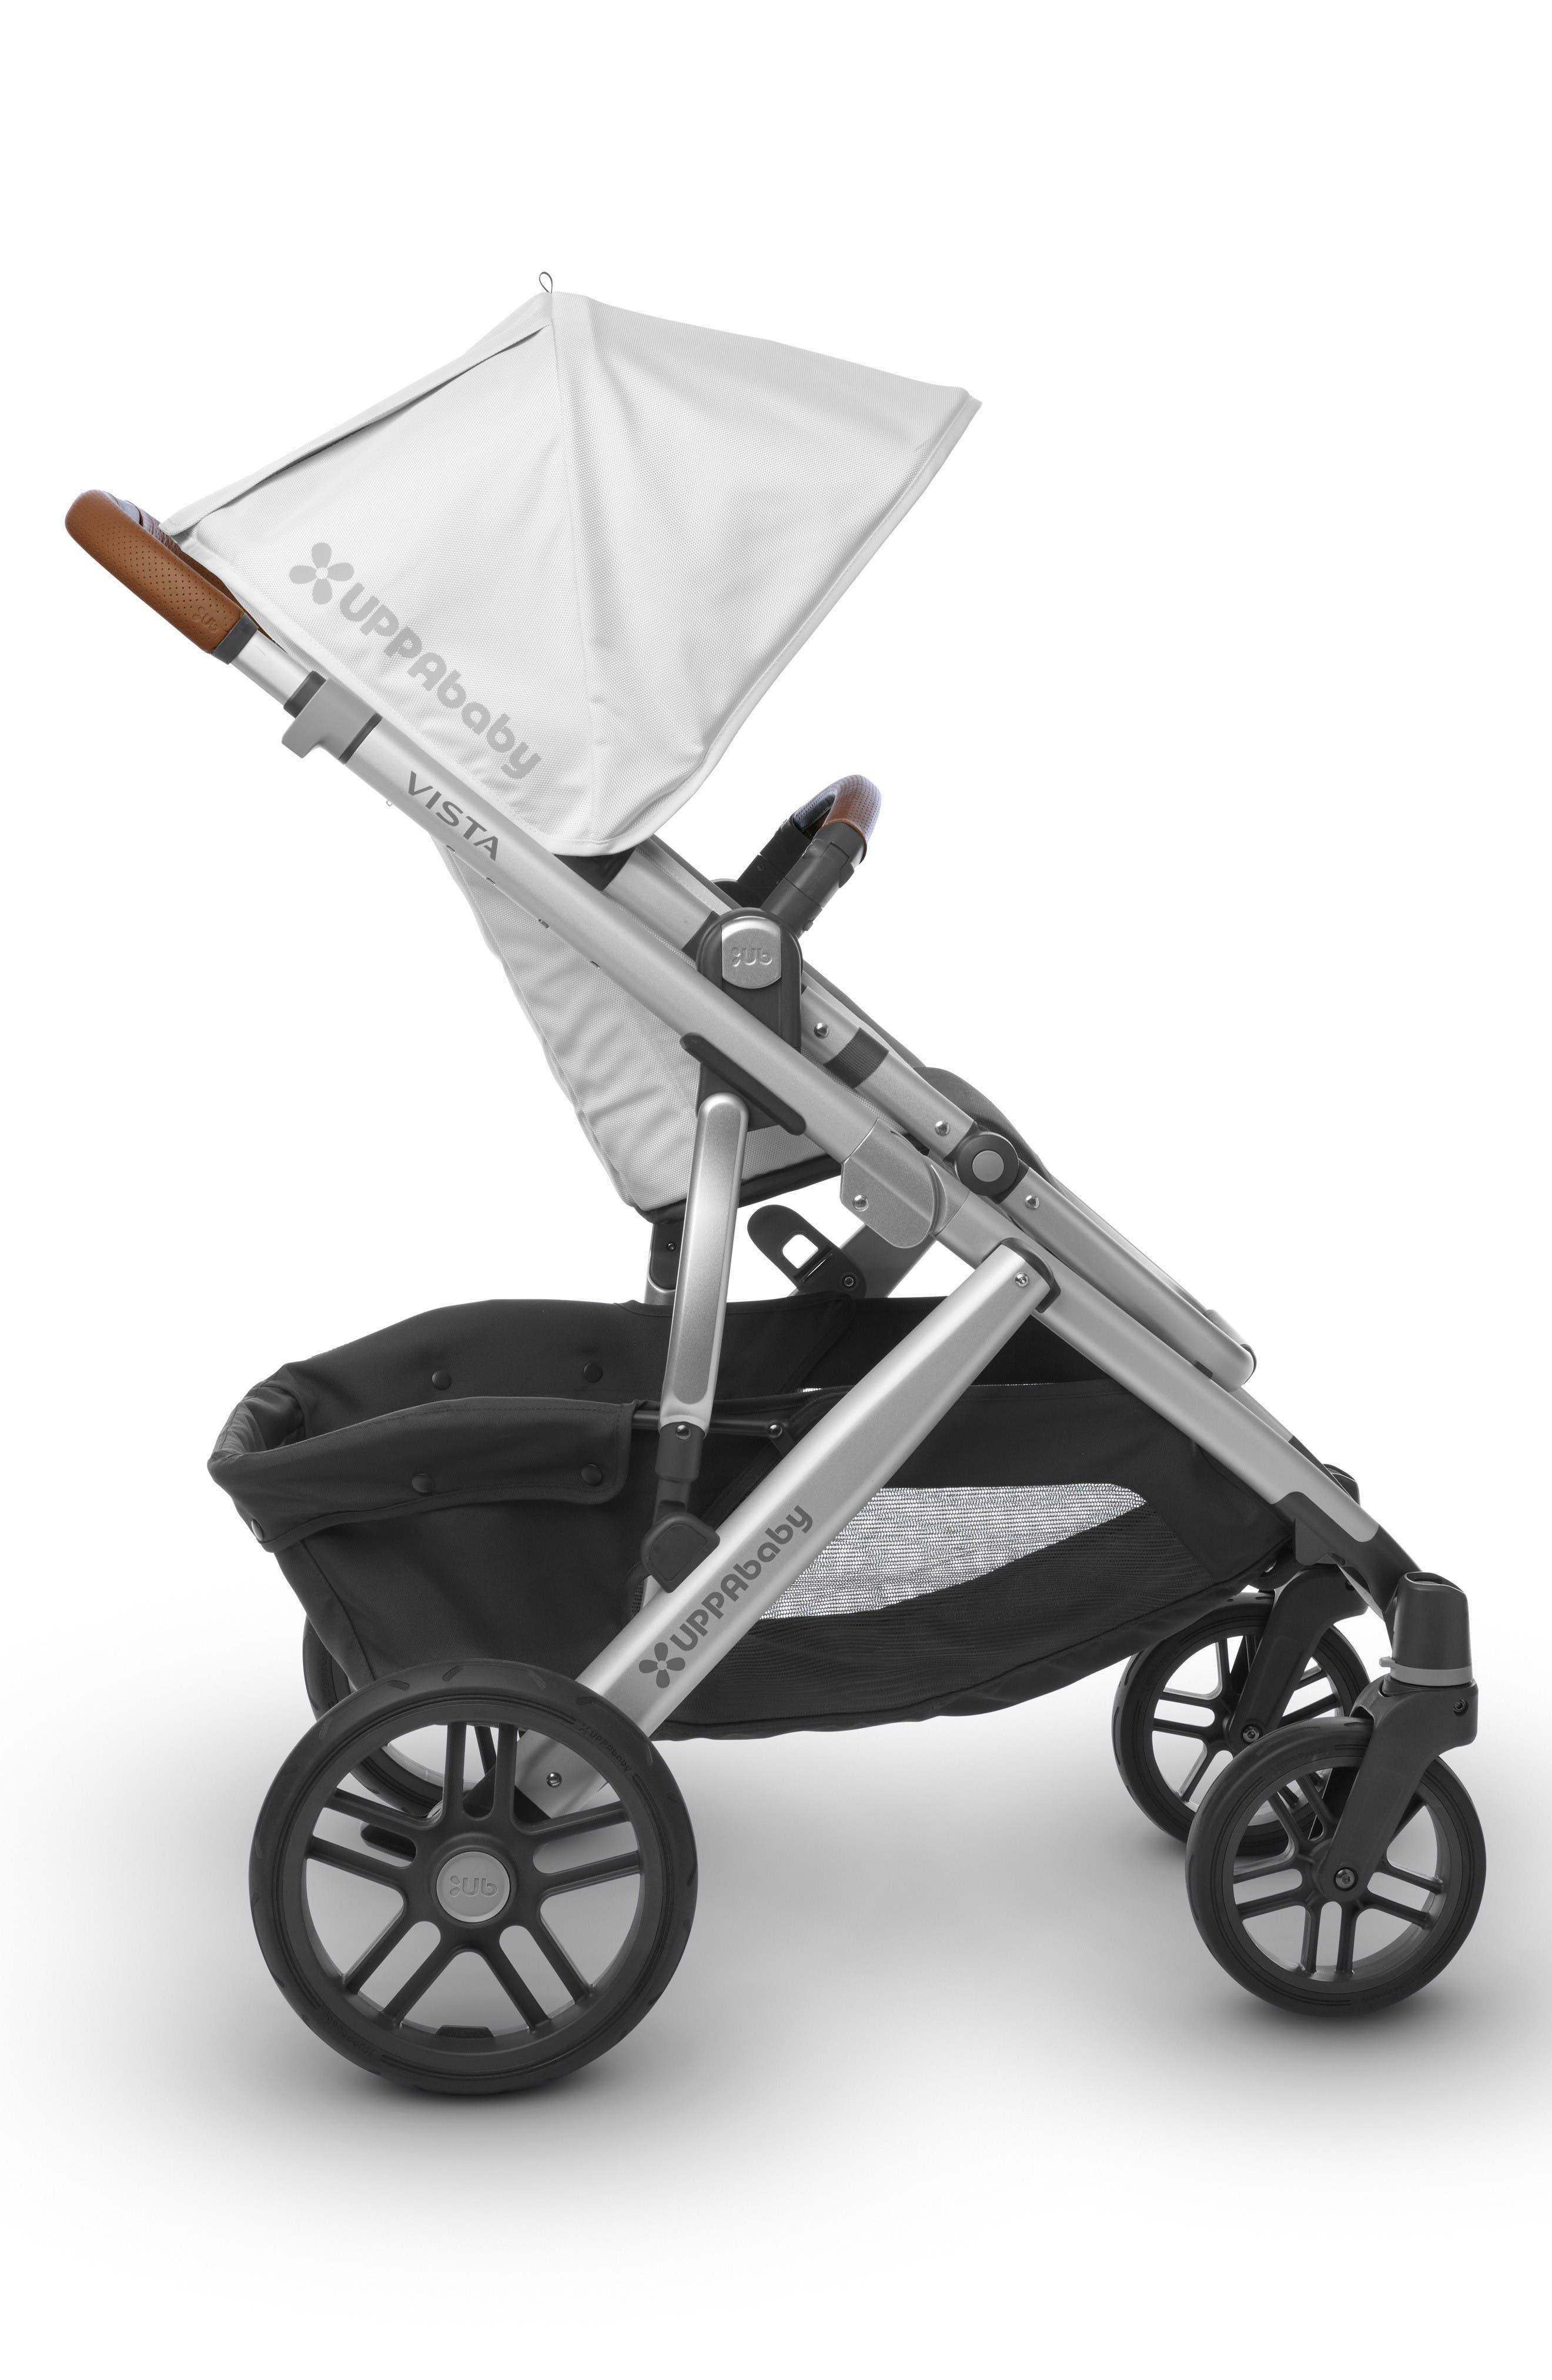 2017 VISTA Aluminum Frame Convertible Stroller with Bassinet & Toddler Seat,                             Alternate thumbnail 4, color,                             White/ Silver